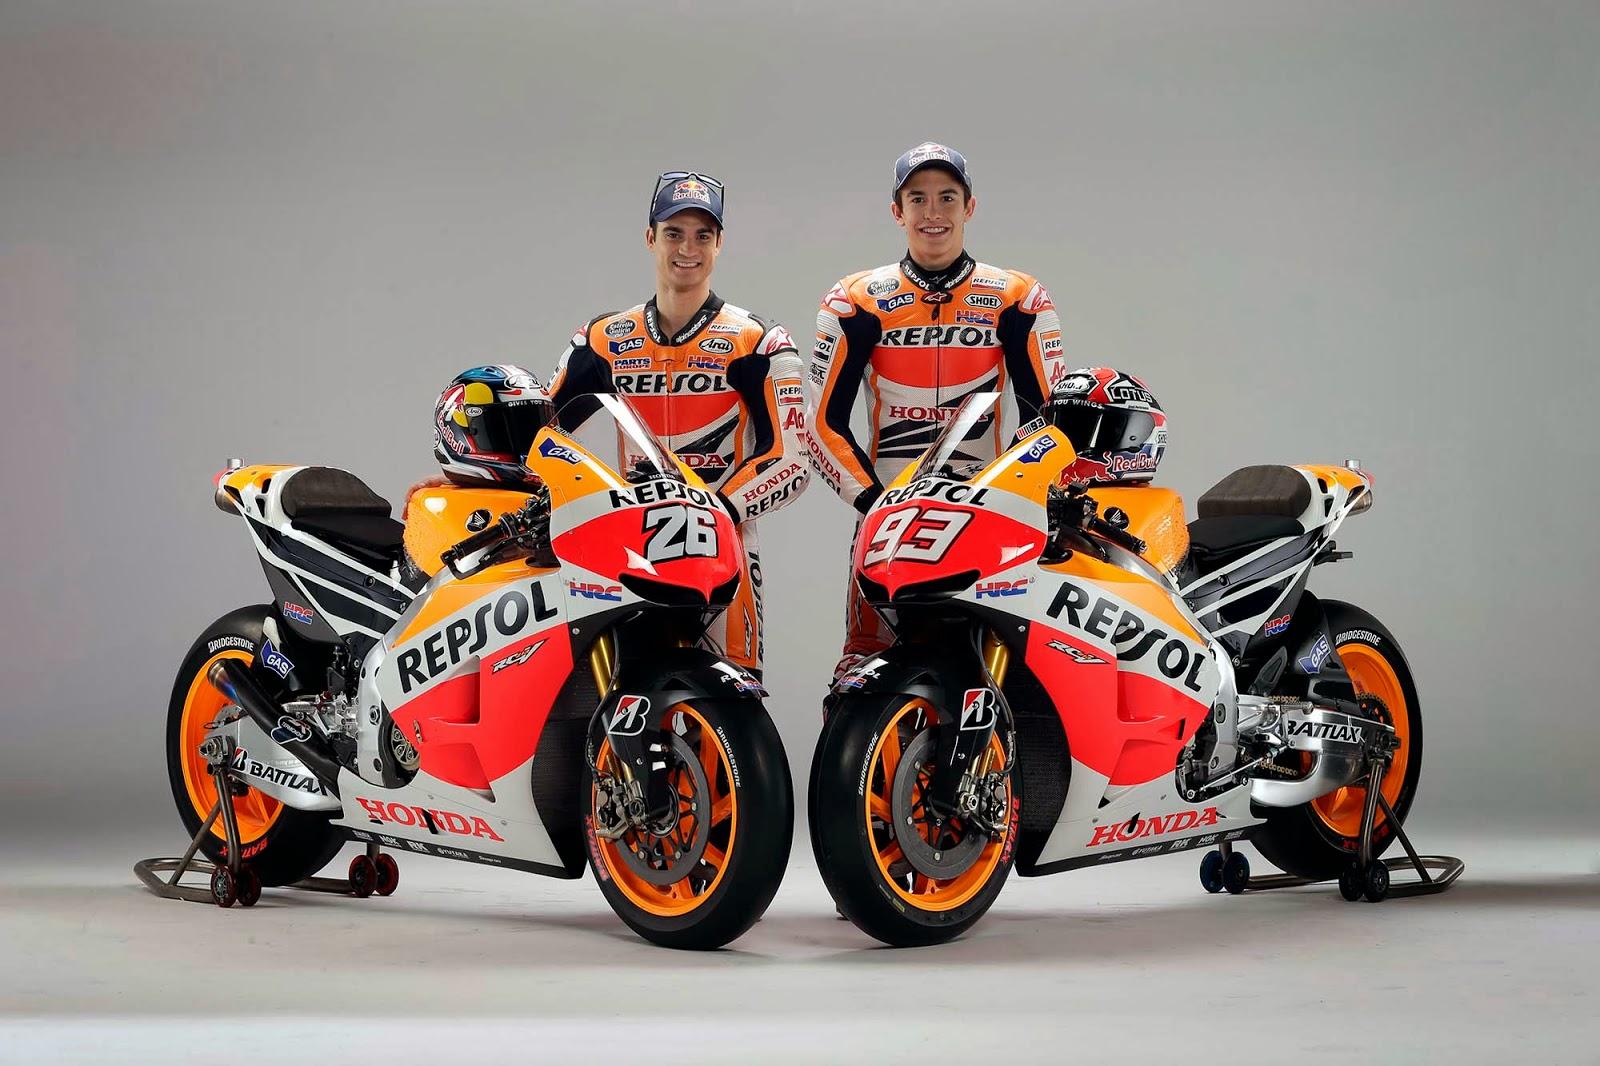 Seamless-Shift Gearbox | MotoGP | Honda RC213V | Motorsports | 2013 Honda RC213V | way2speed.com